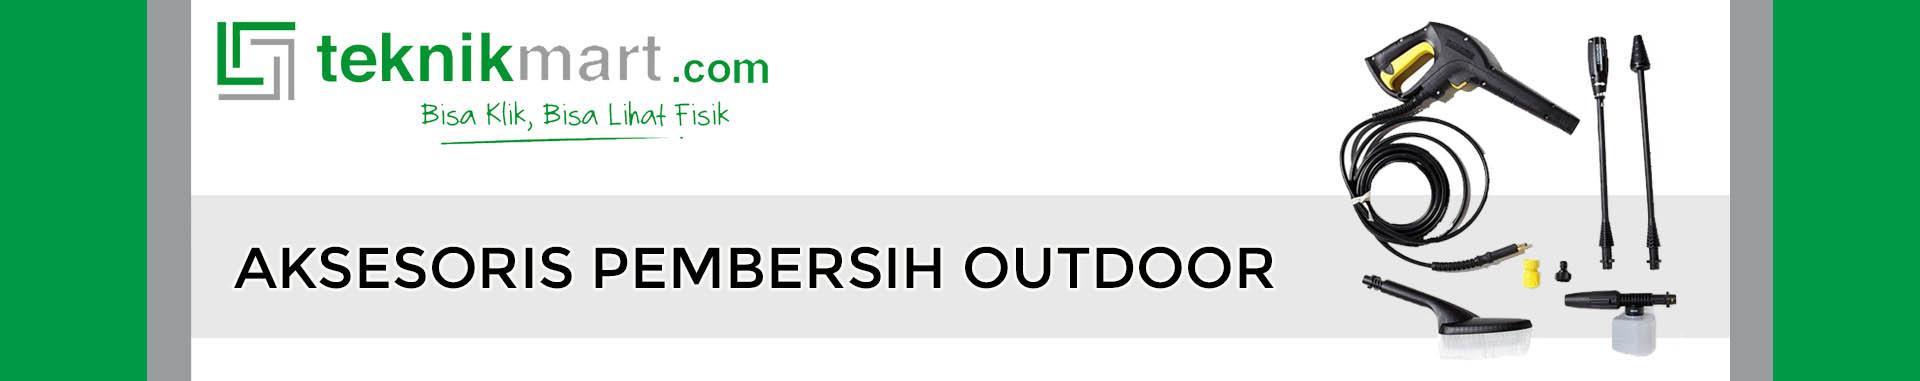 Aksesoris Pembersih Outdoor